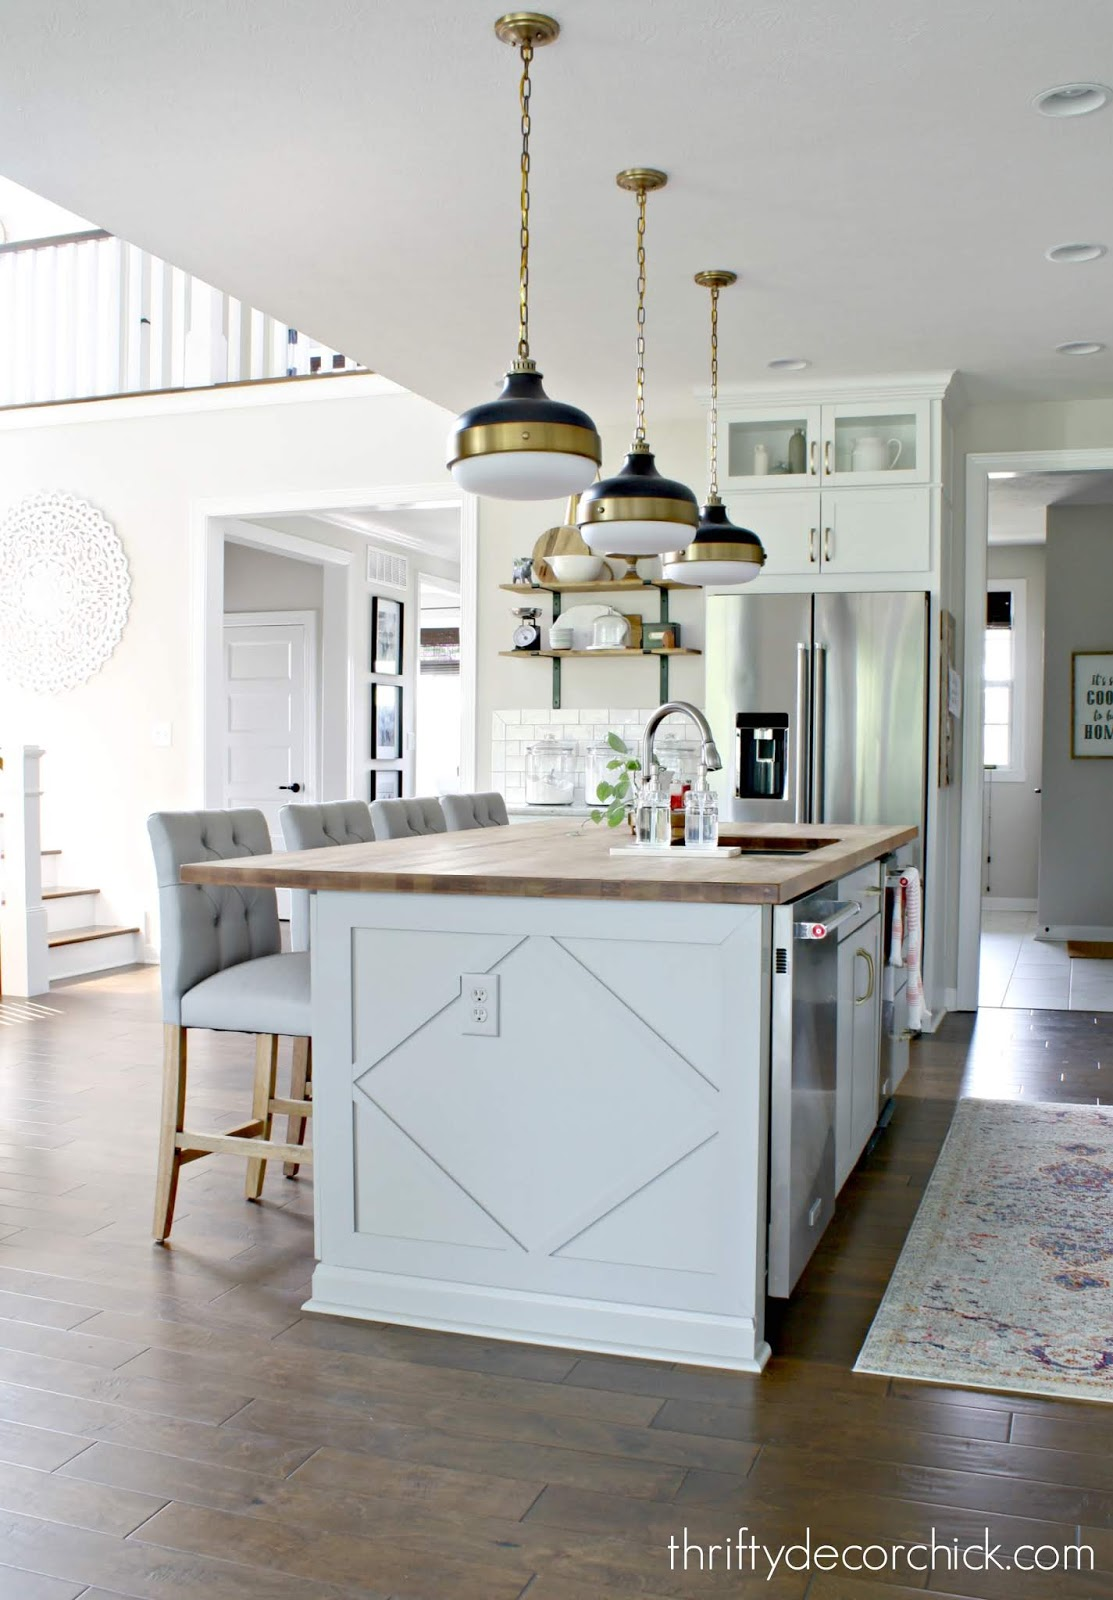 Adding custom detail to a plain kitchen island from - Adding a kitchen island ...